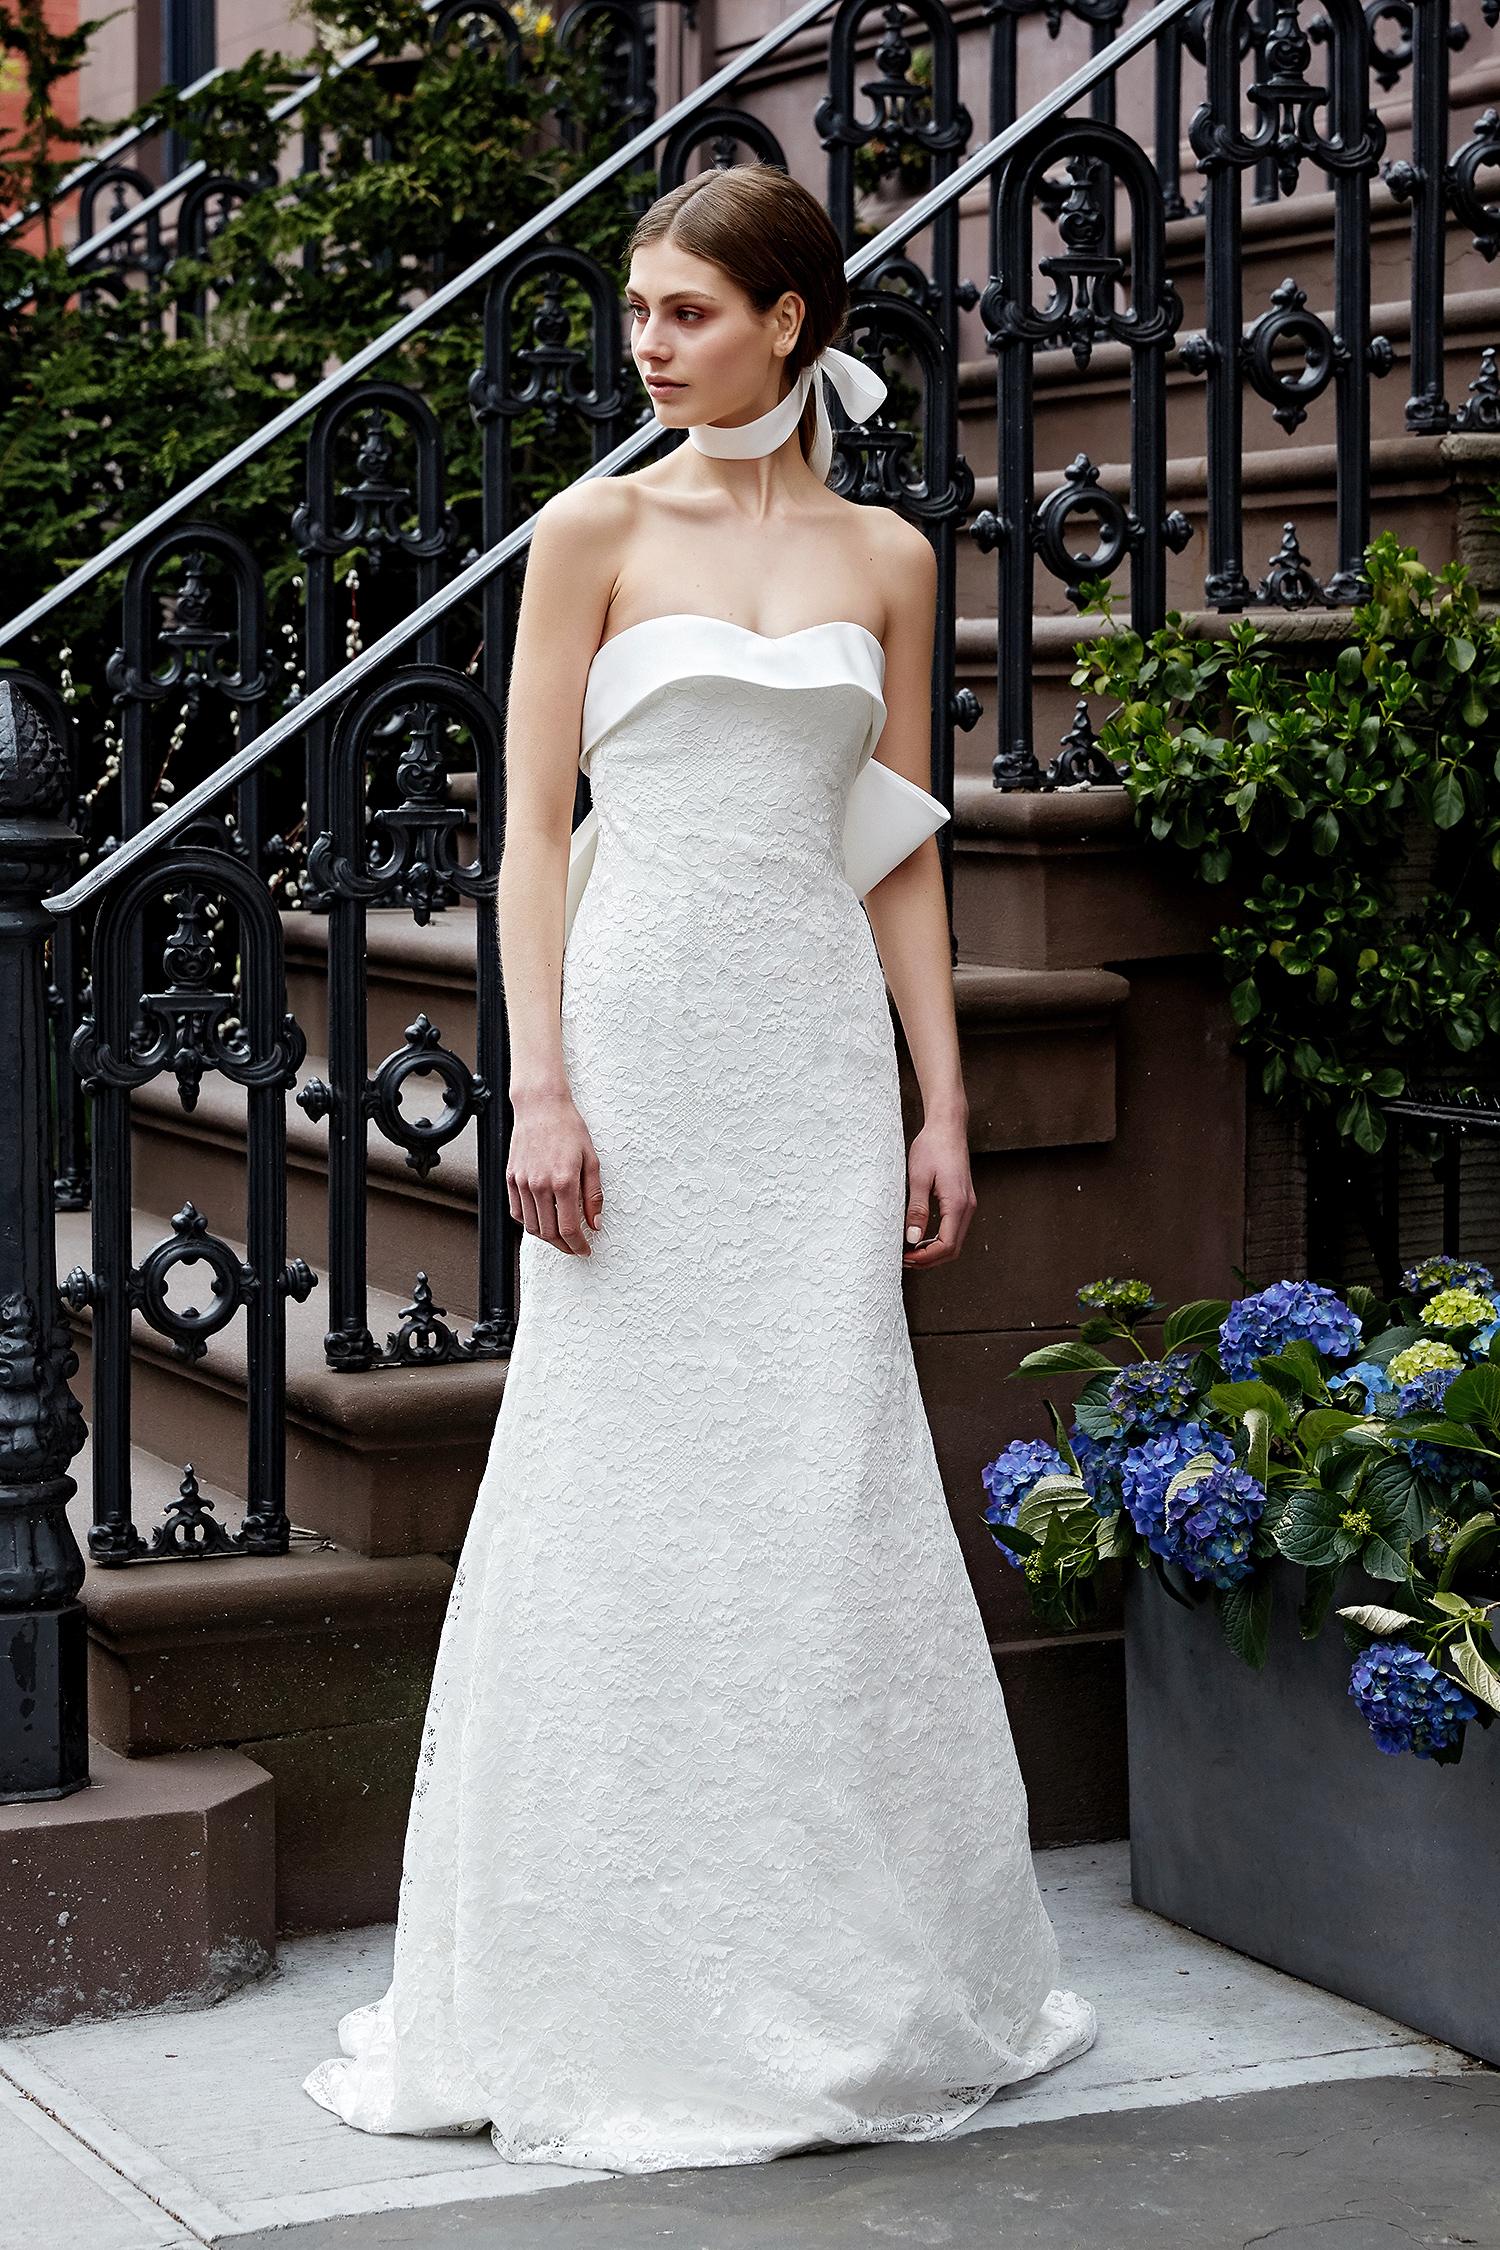 lela rose wedding dress spring 2019 strapless a-line back bow accent